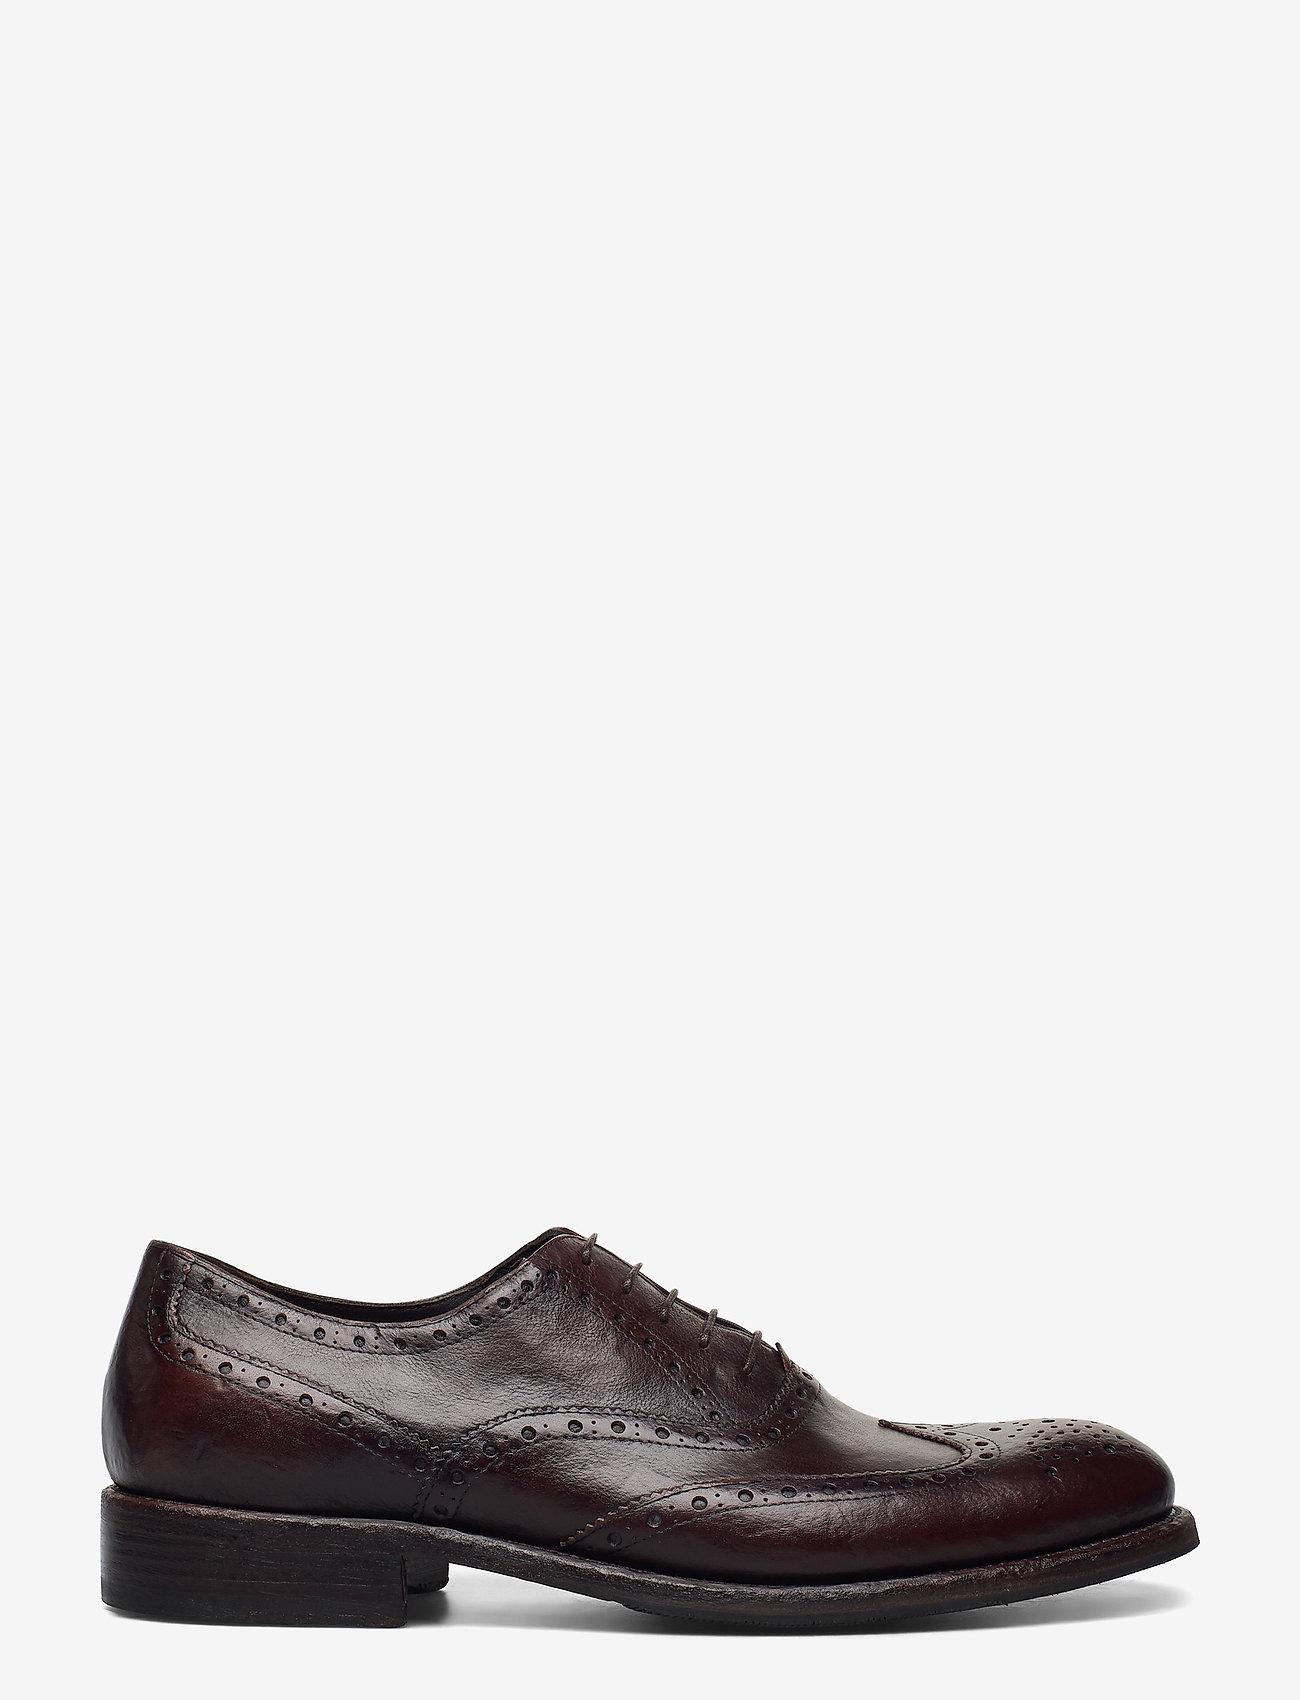 SAND - Footwear MW - F316 - nauhakengät - dark brown - 1